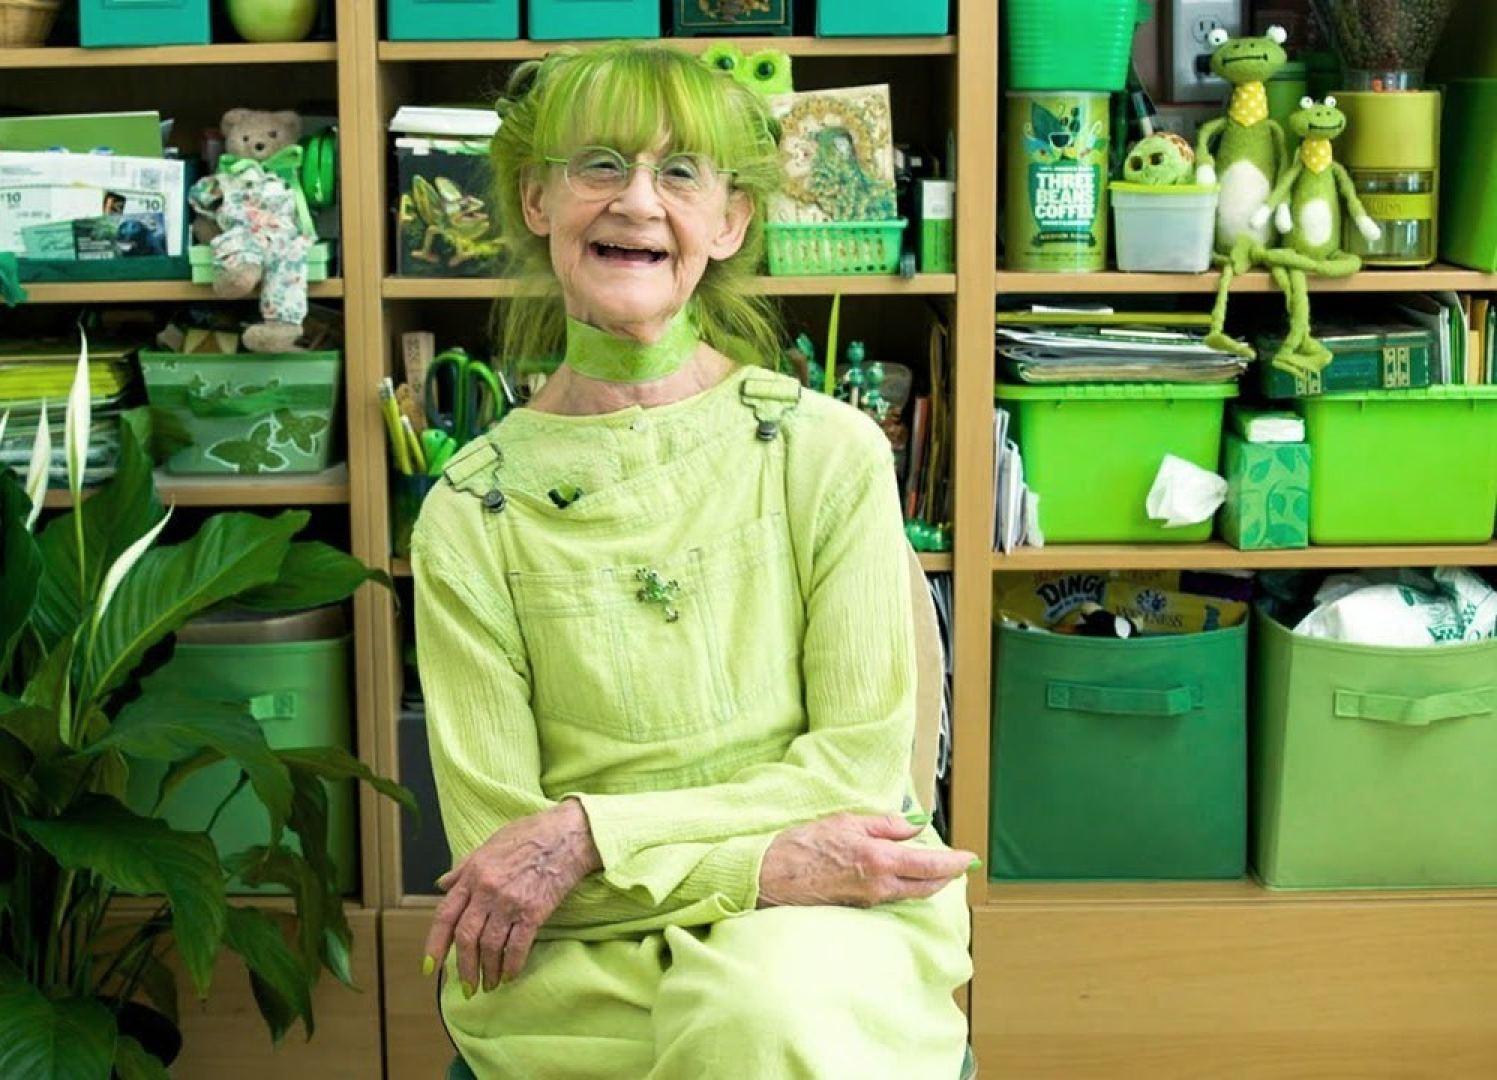 idesign green lady quy ba mau xanh 02